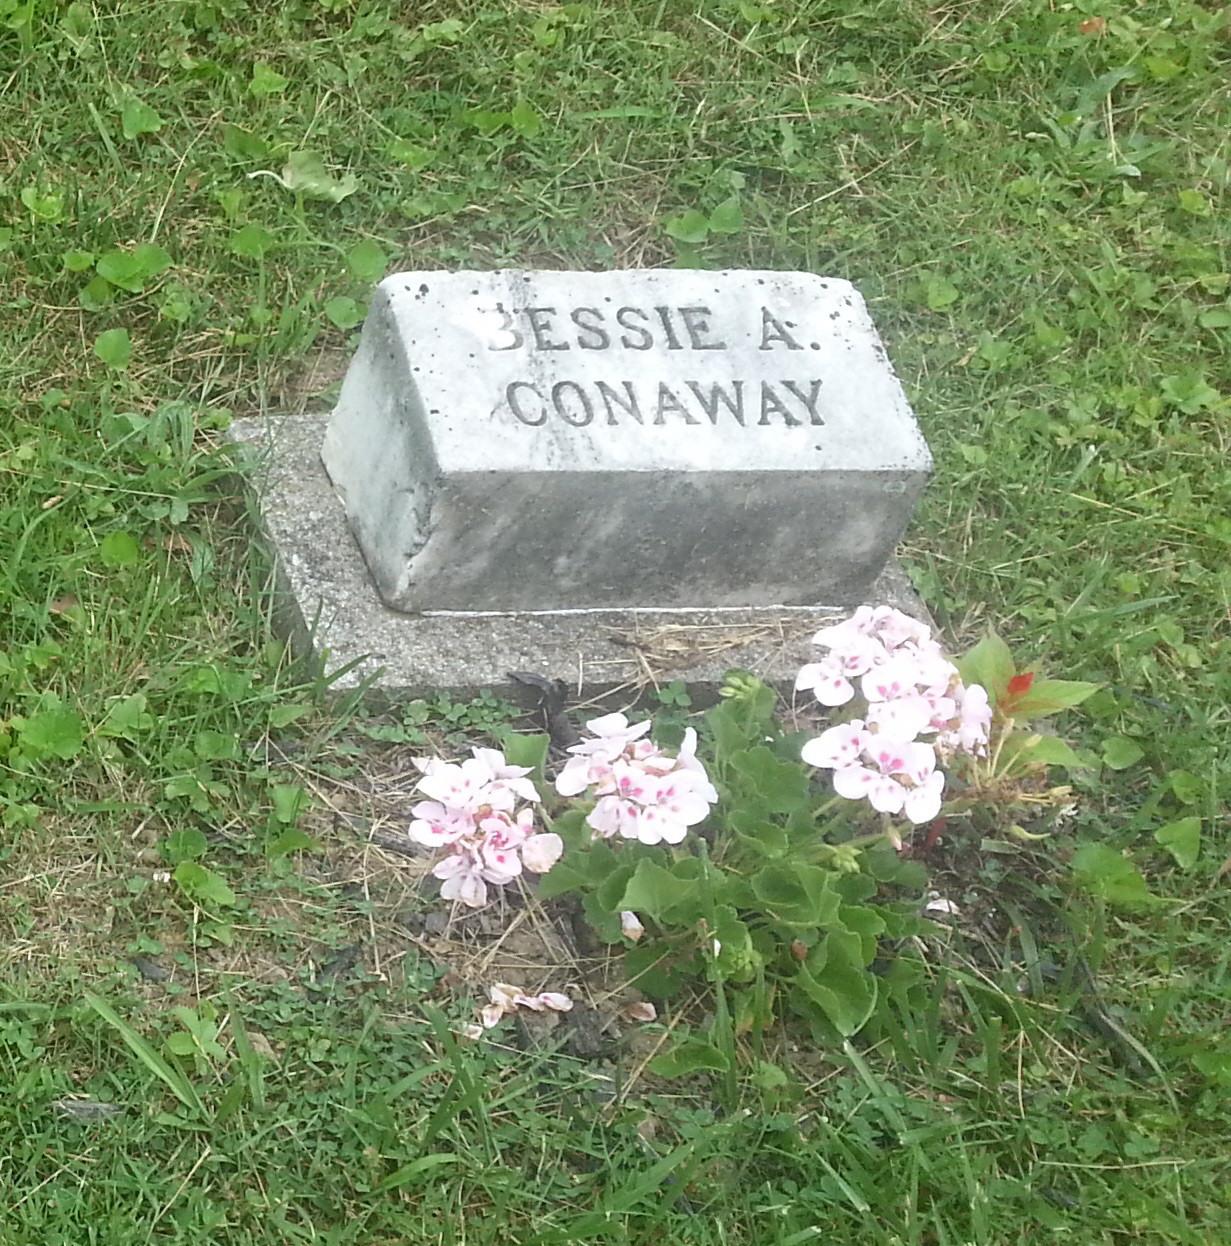 Antonio Conaway